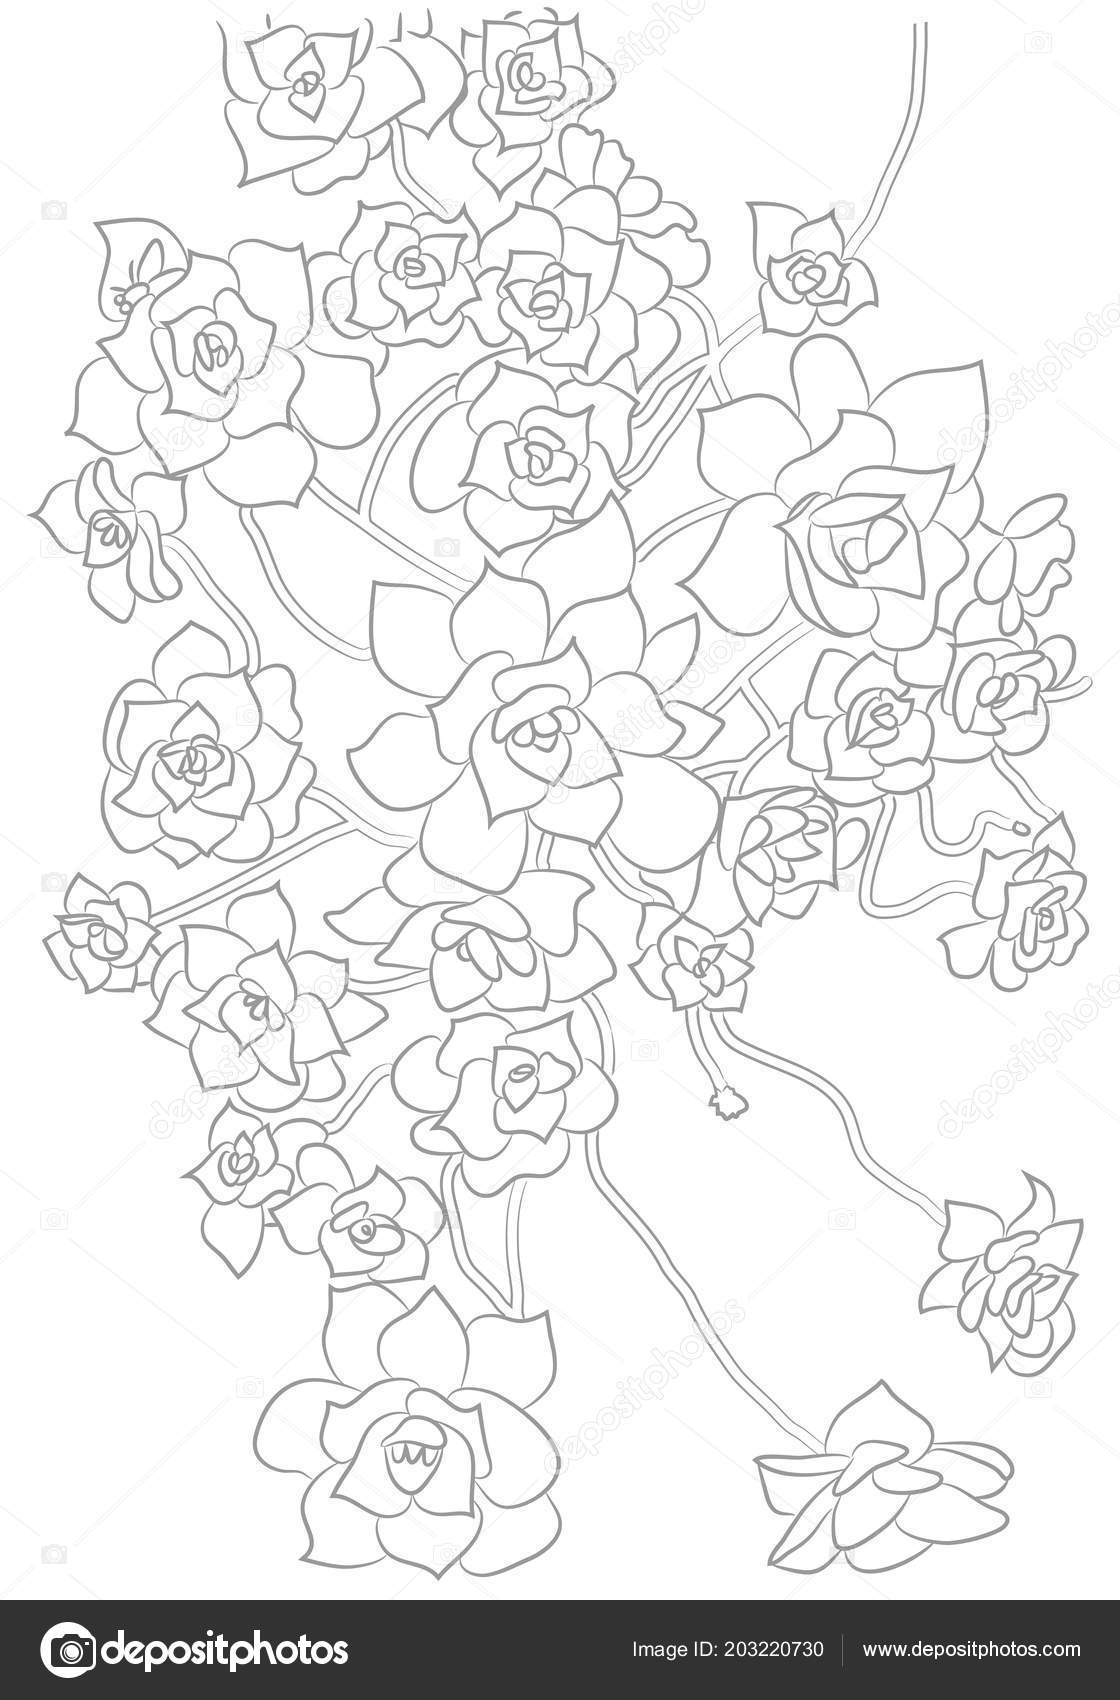 Succulent Outline Drawing Vector Contour Illustration Succulents Outline Drawing Plant Coloring Book Botanical Stock Vector C Diana Vasileva 203220730